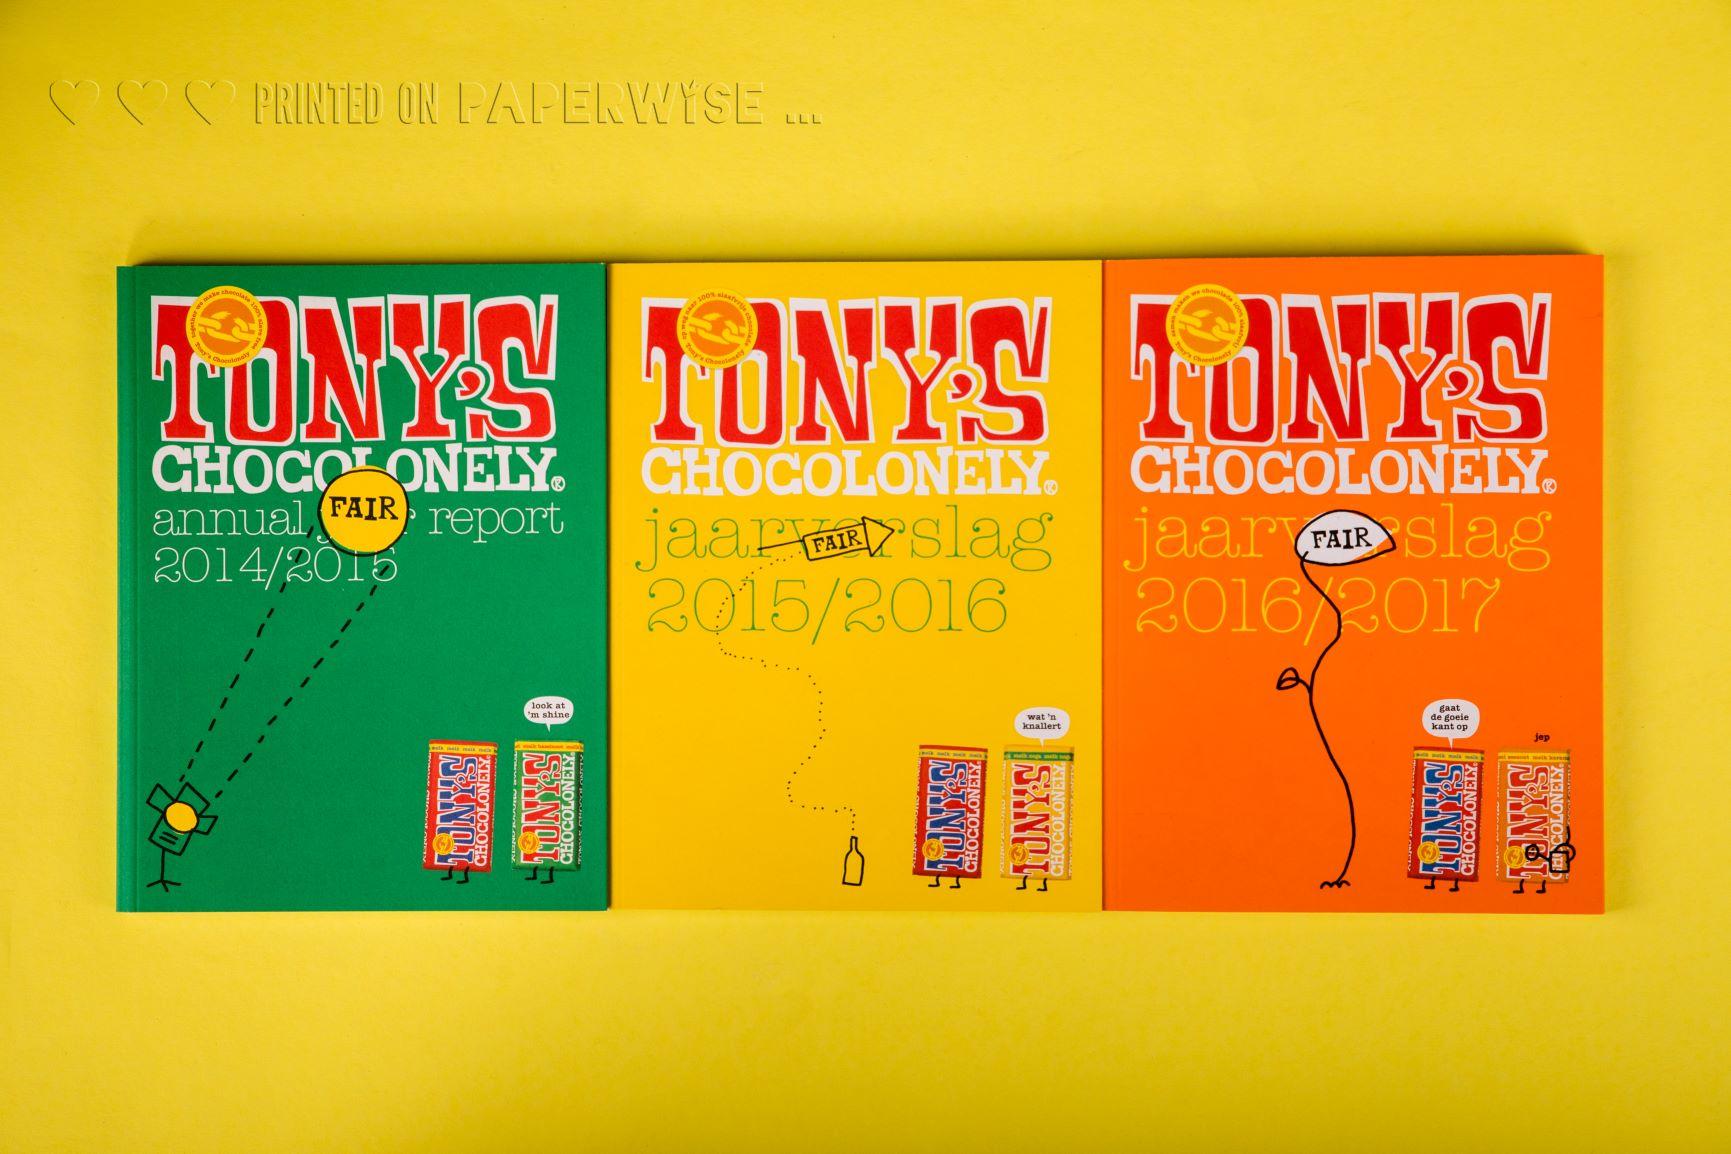 PaperWise-printing-annual-report-Tonys-CSR-9small.jpg